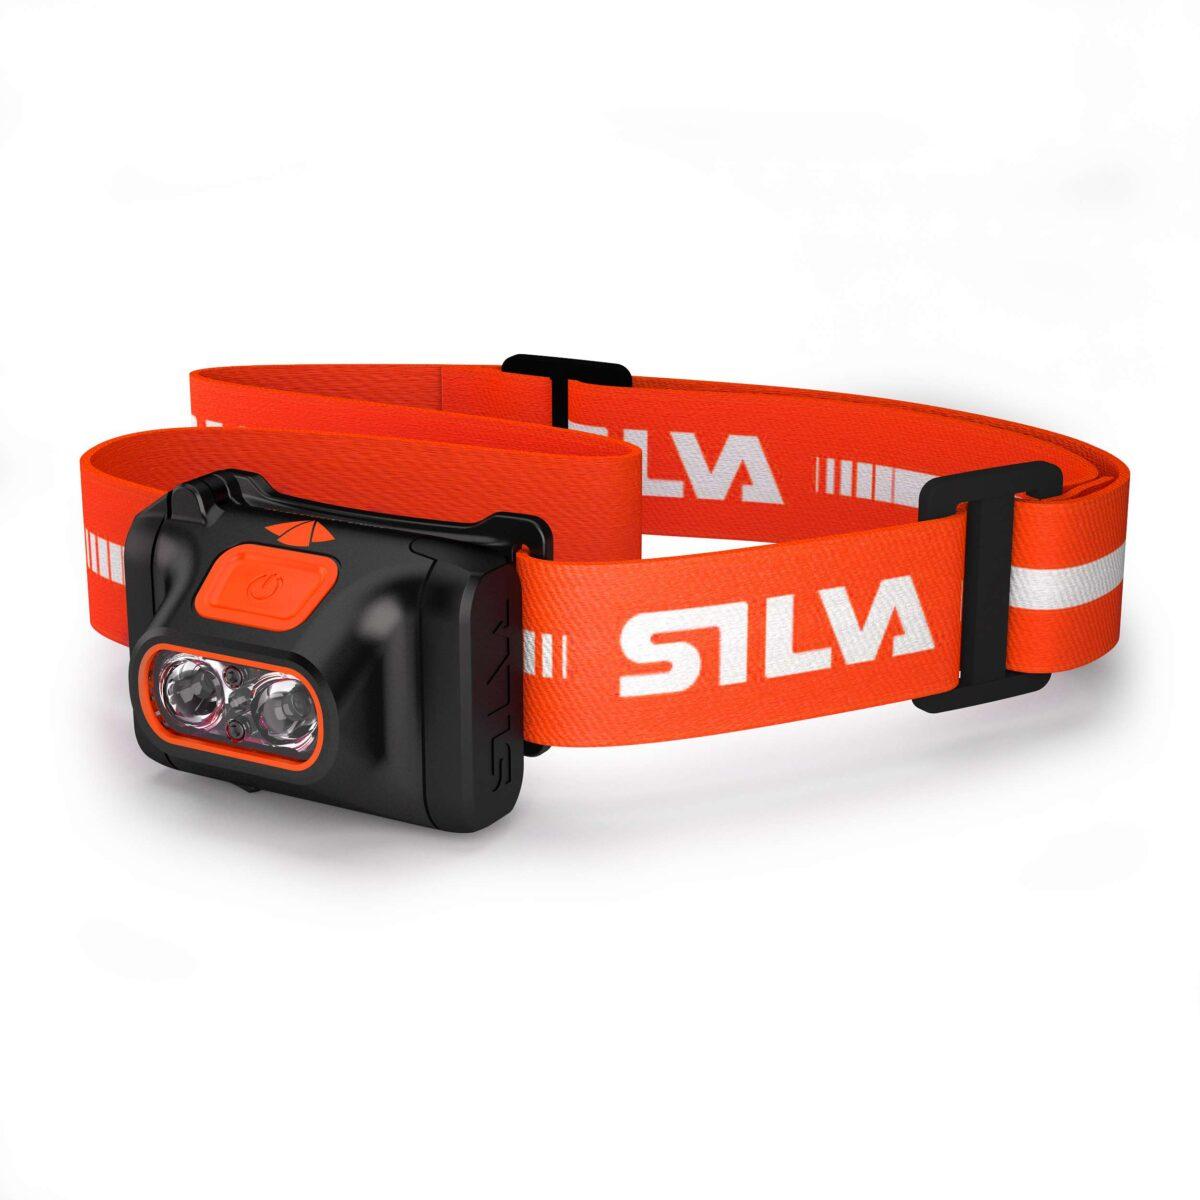 "Silva Stirnlampe ""Scout"" - Leichtathletik - Silva"